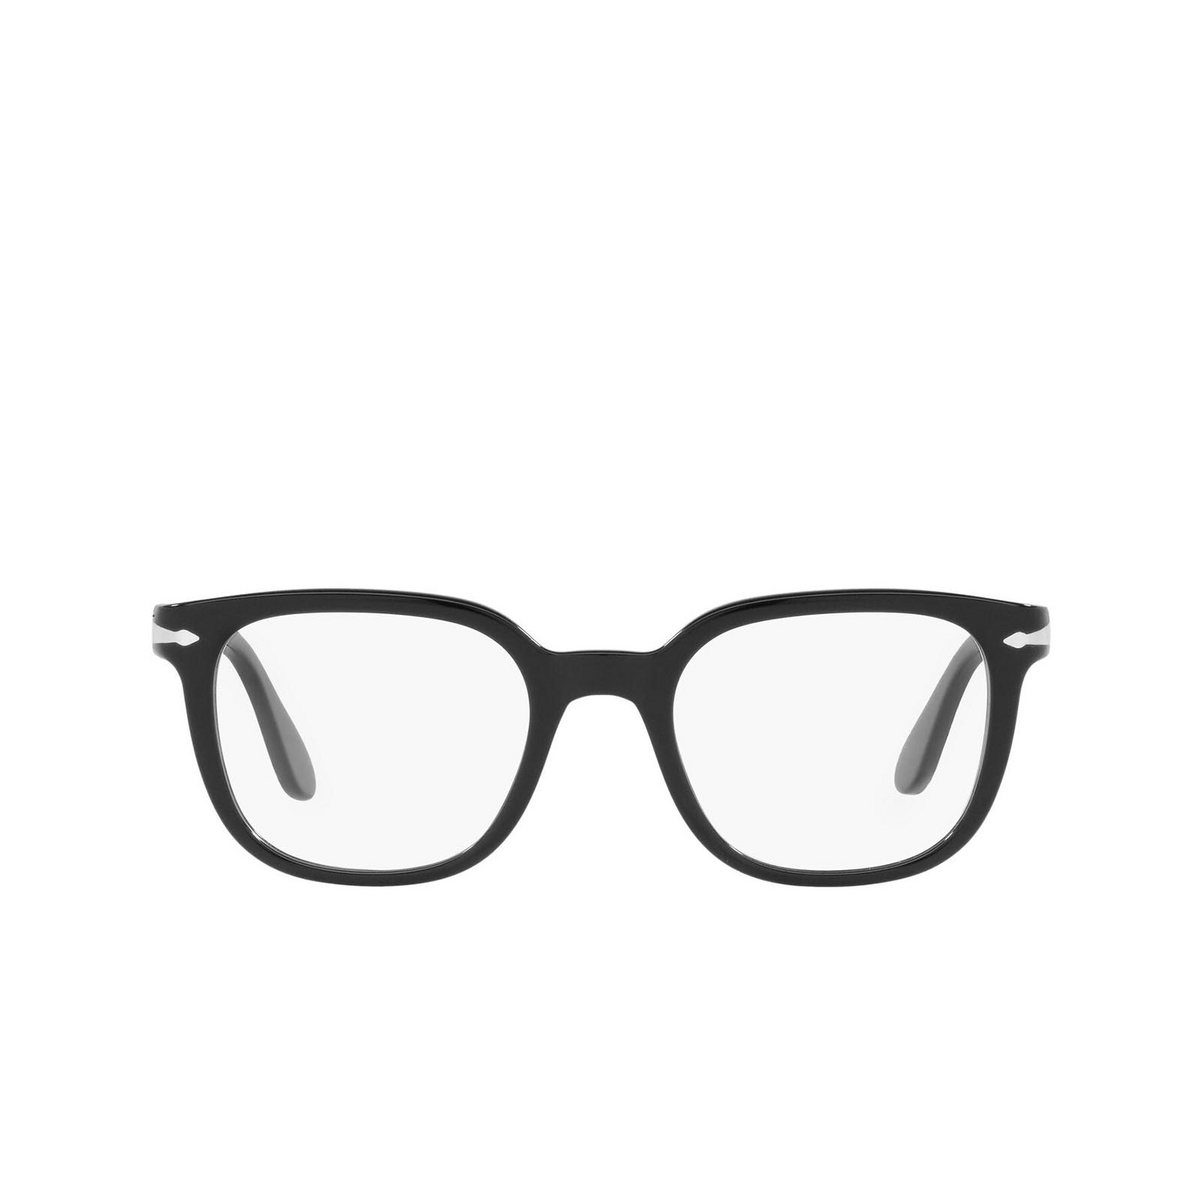 Persol® Square Eyeglasses: PO3263V color Black 95 - front view.